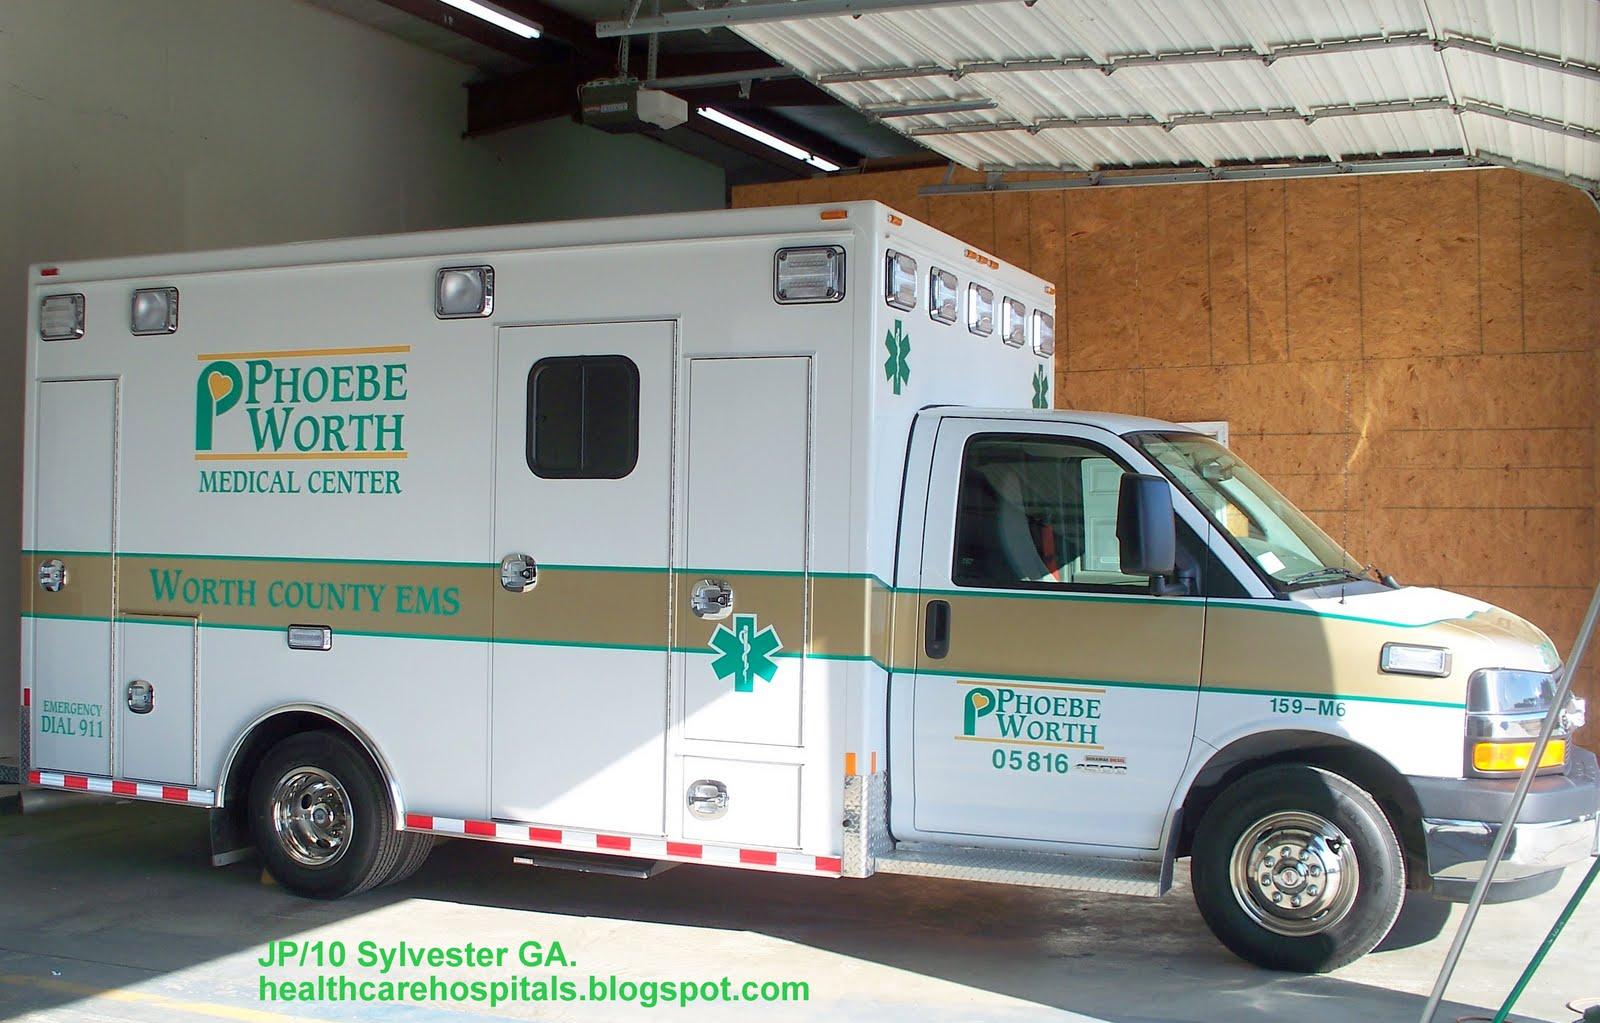 phoebe worth medical center hospital ems ambulance emergency phoebe worth medical center hospitals ems ambulance emergency medical services sylvester worth county ga